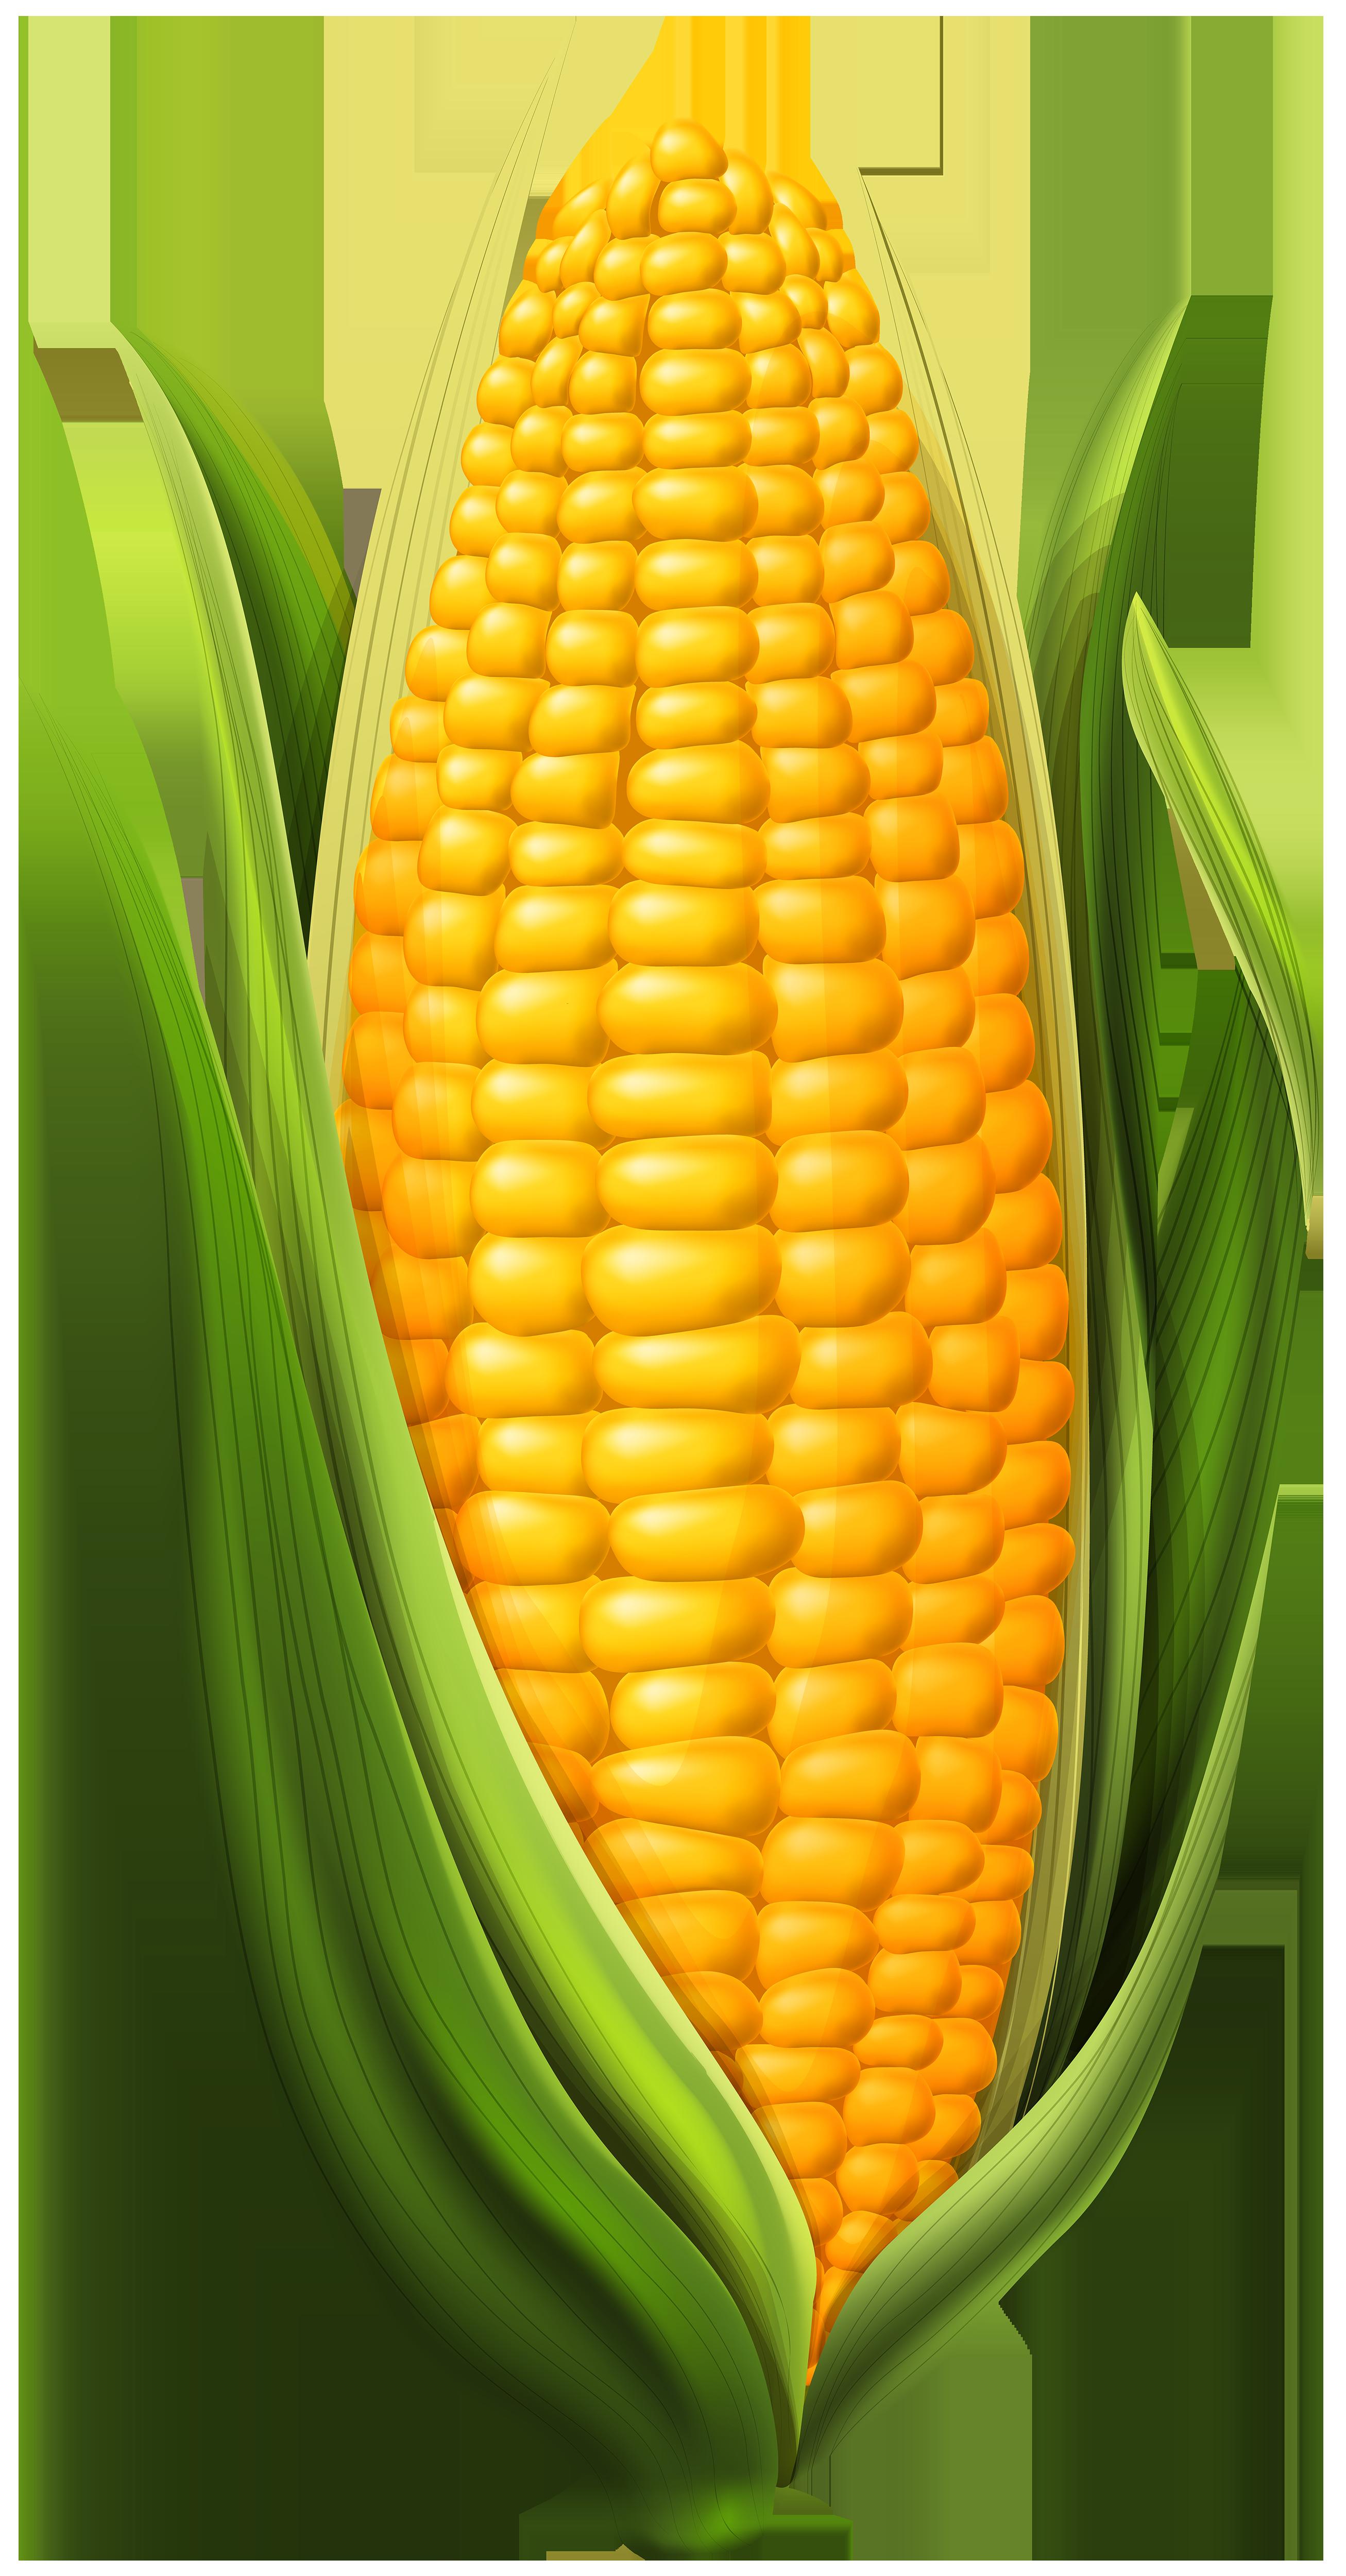 Corn clipart. Png clip art image